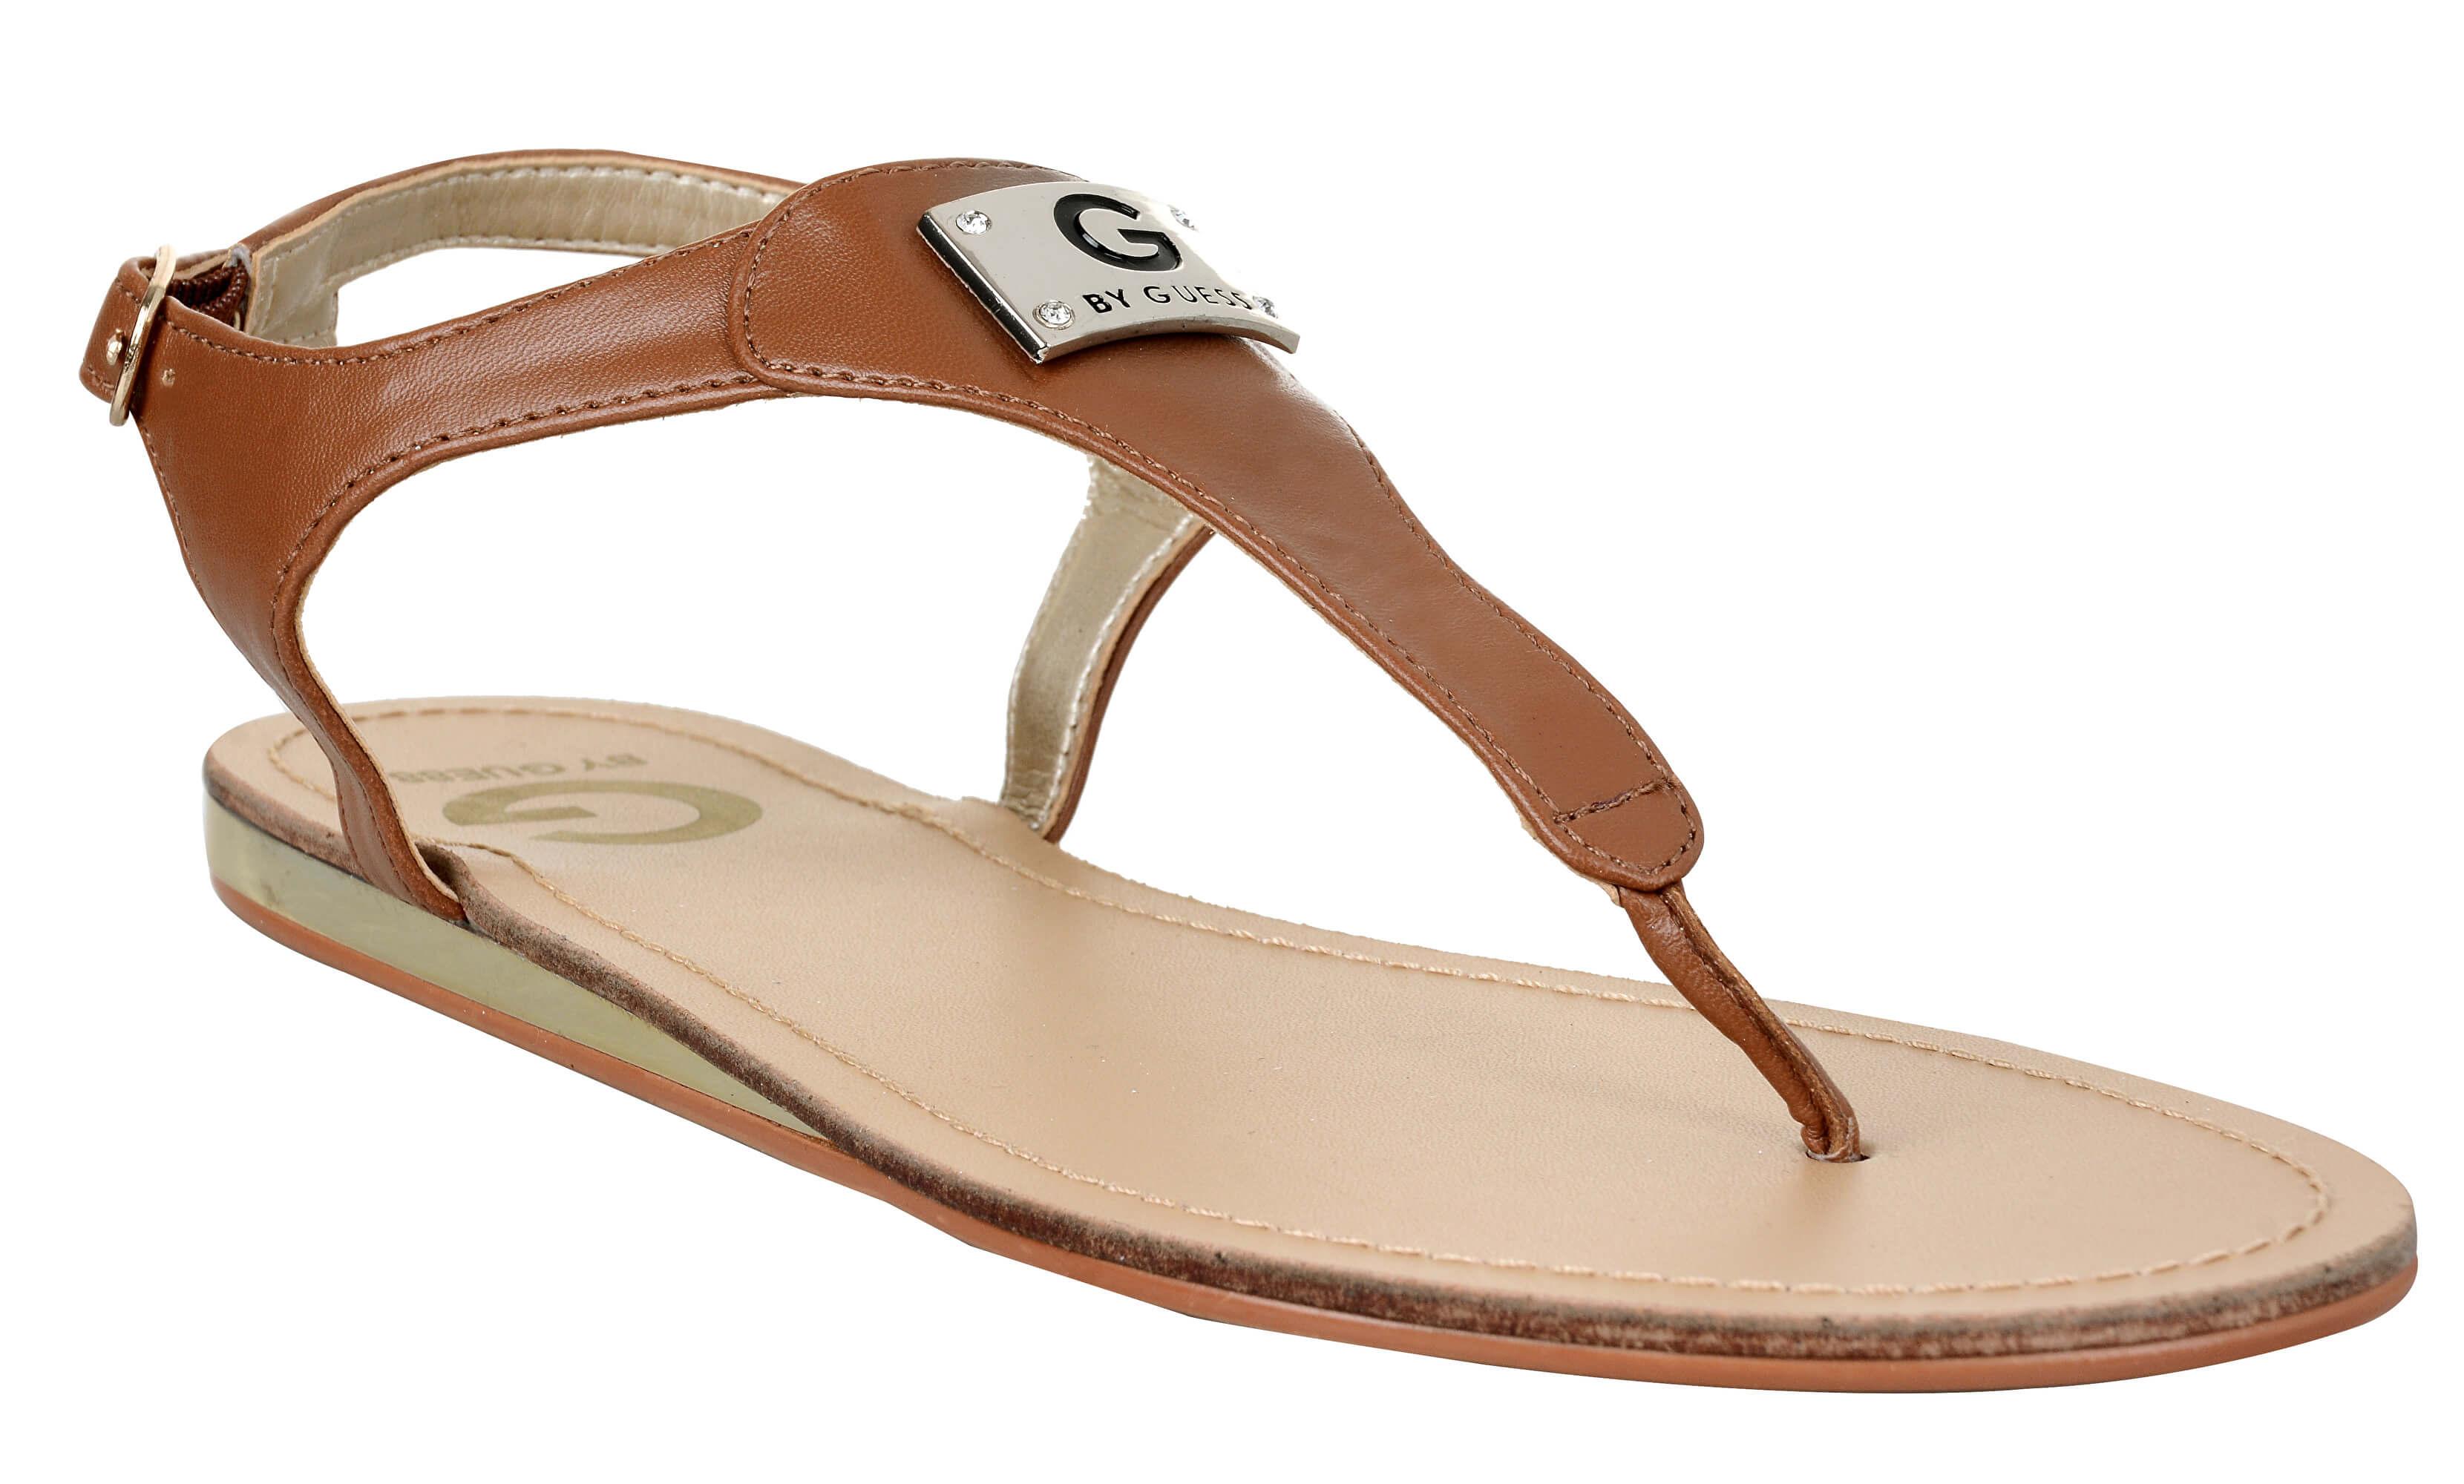 Guess Sandale pentru femei G de Guess Carmela T- Strap Sandals Brown ... a7fa7a77eba